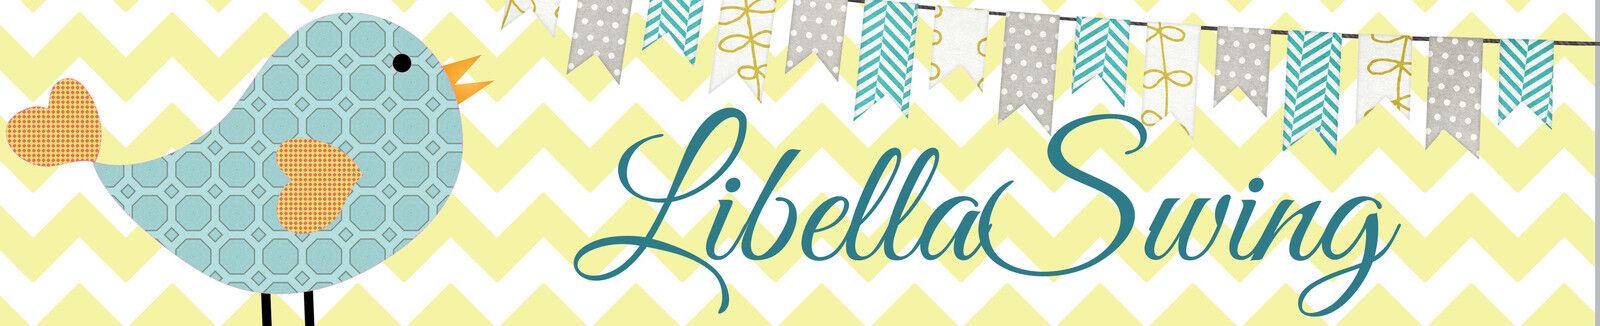 libellaswing1